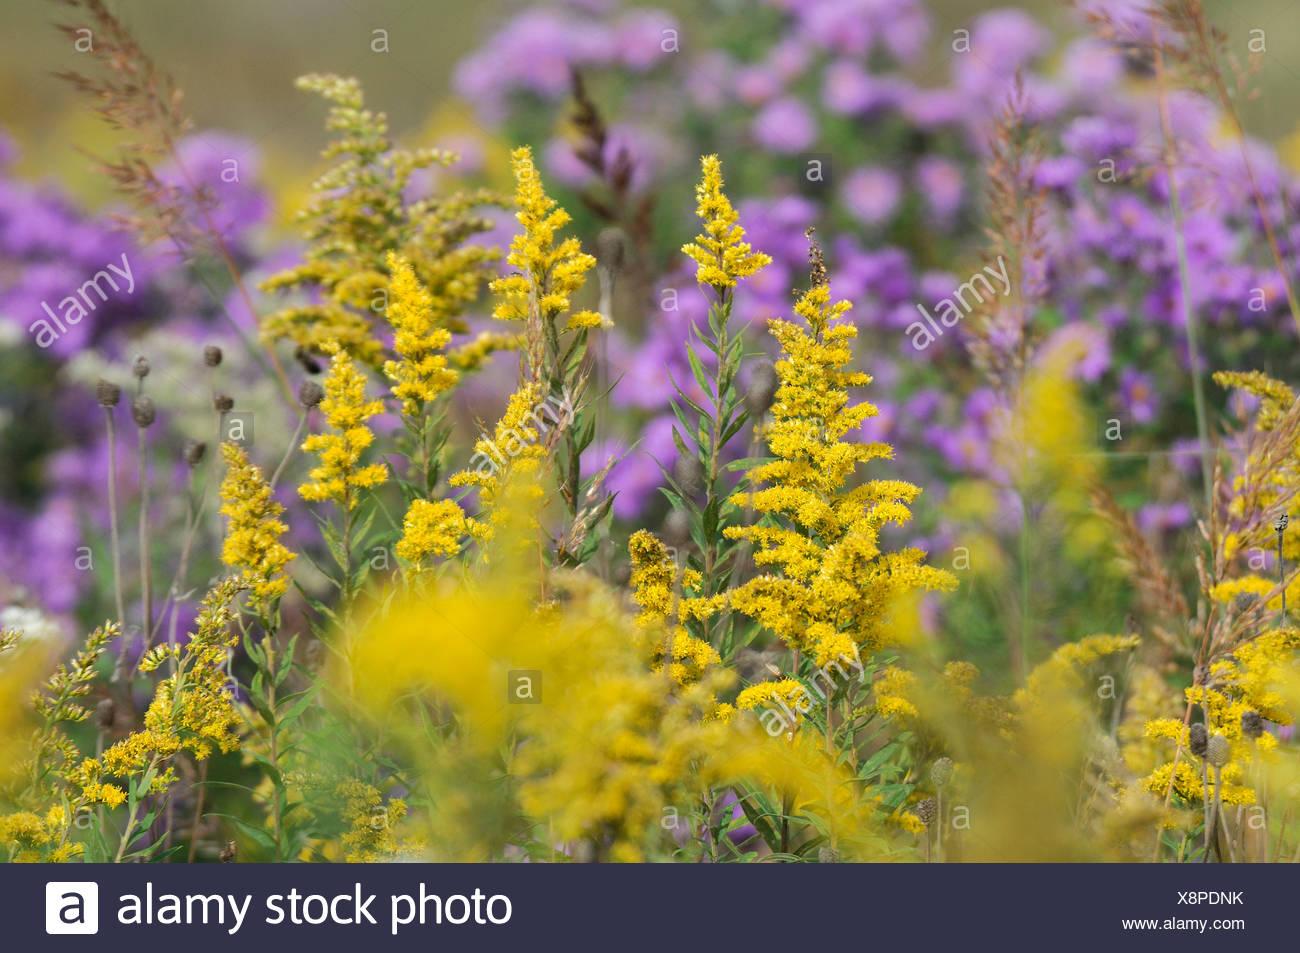 Fall flowers near hooppole illinois usa meadow nature flowers fall flowers near hooppole illinois usa meadow nature flowers colorful yellow purple wild flowers close up detail america north mightylinksfo